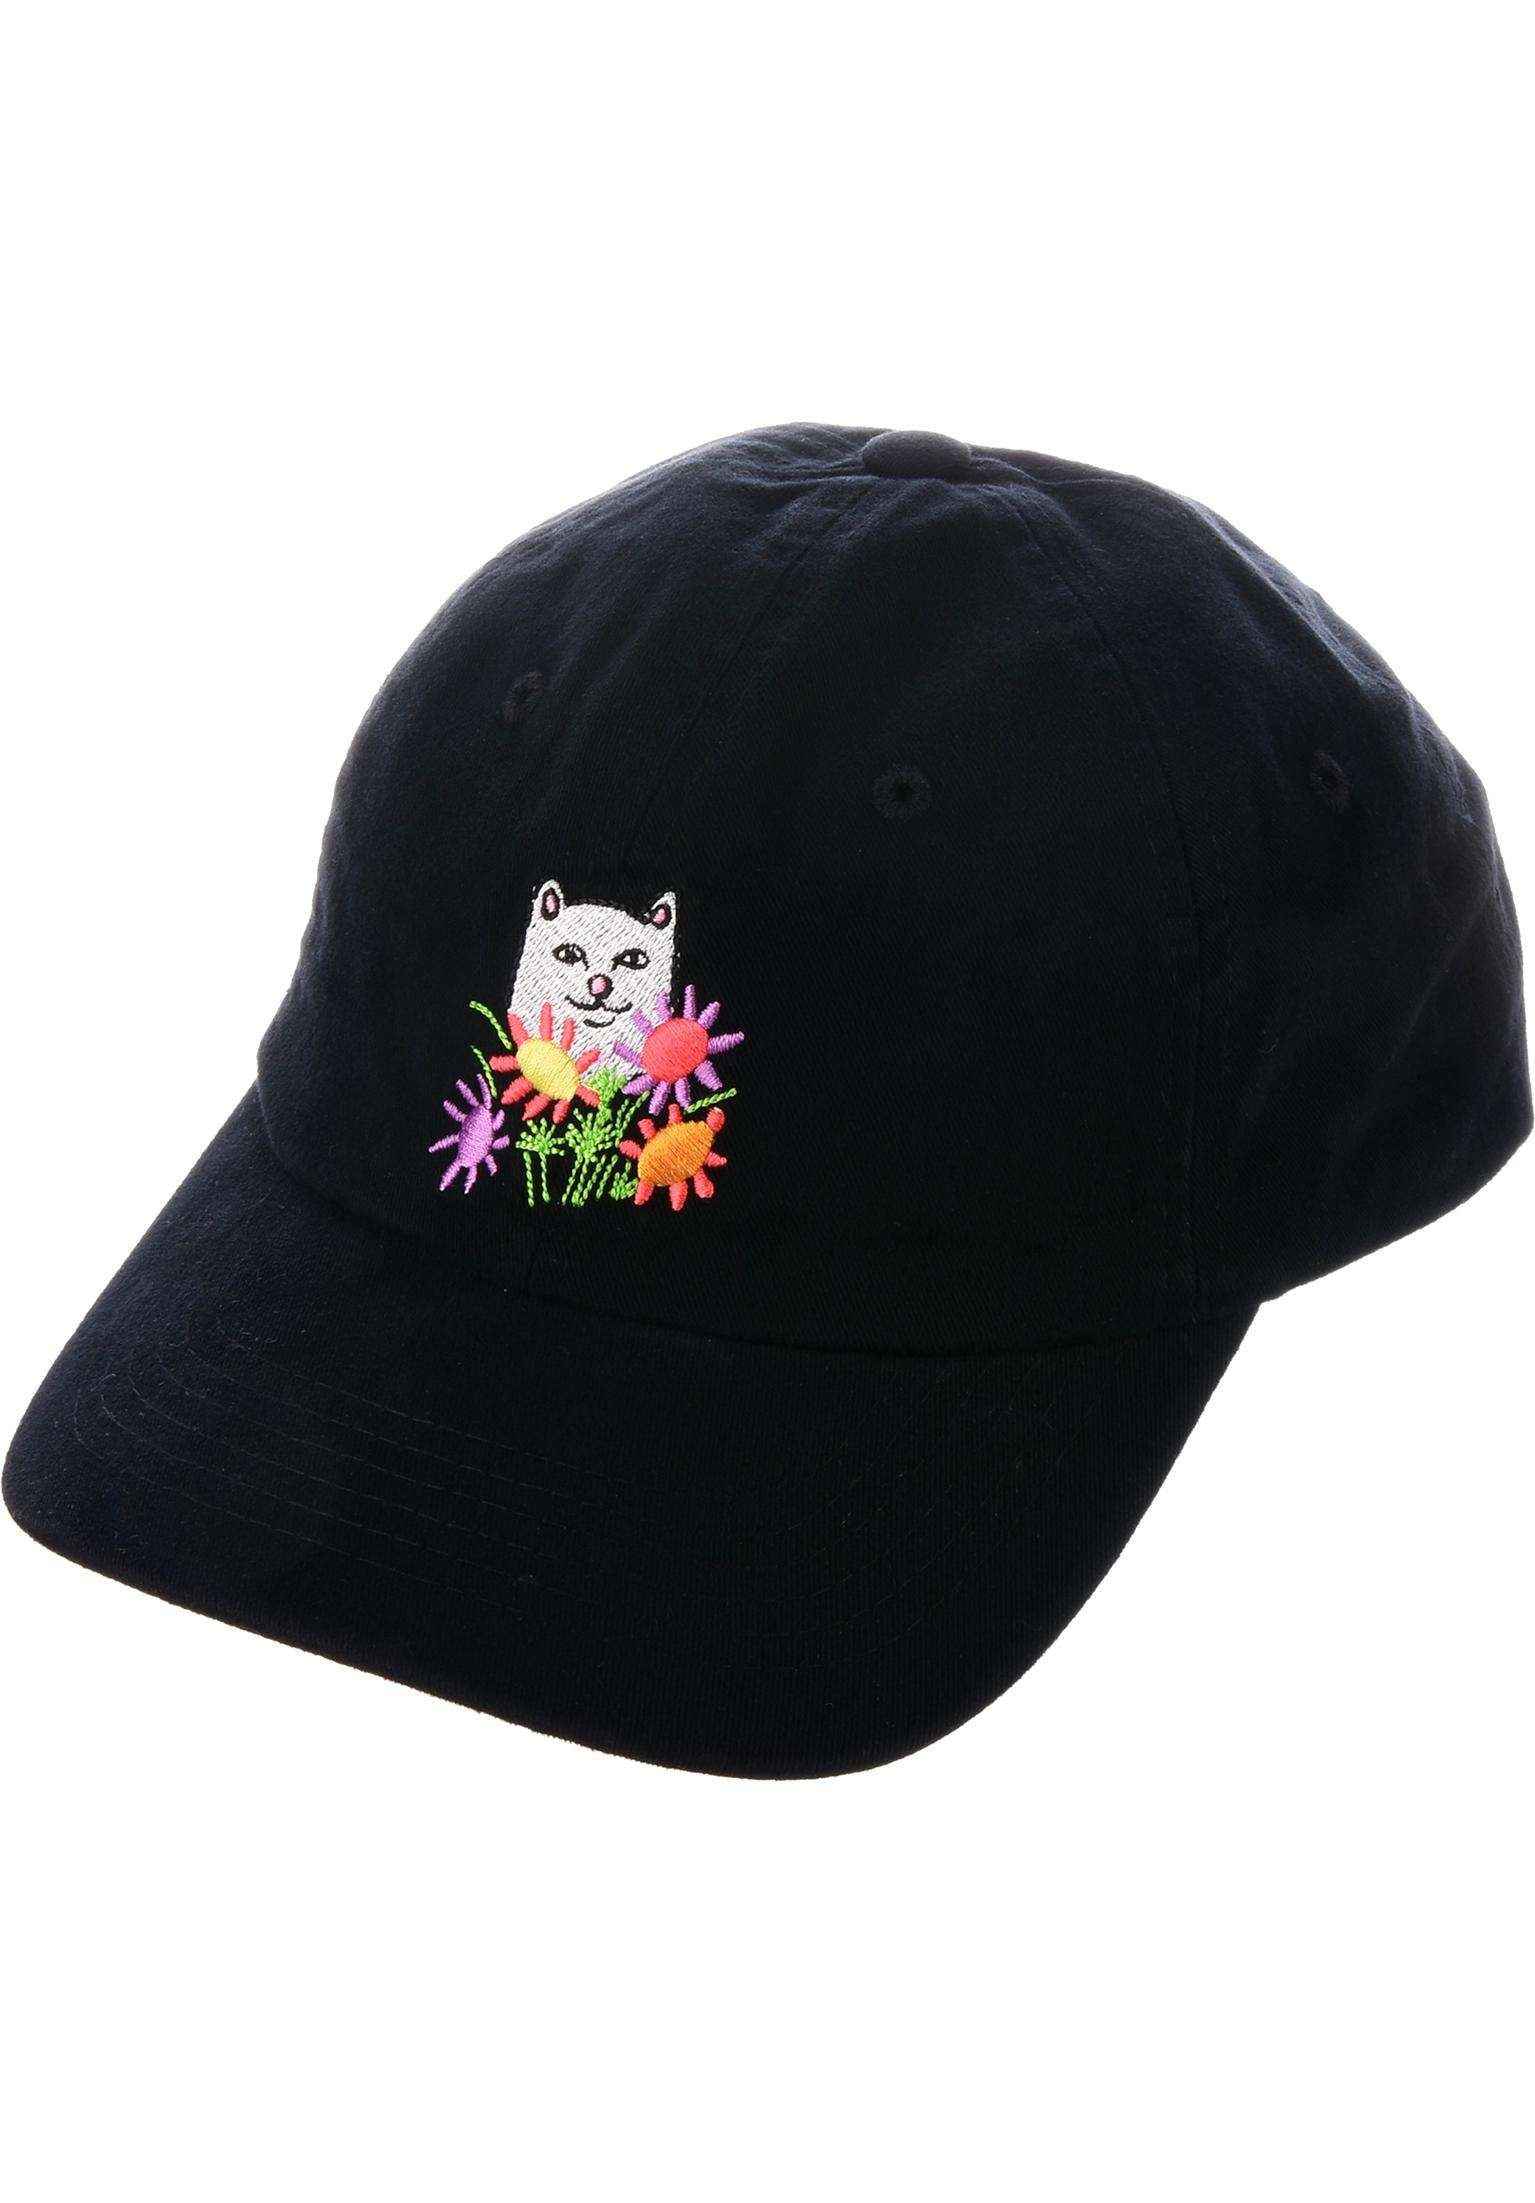 Flower For Bae Rip N Dip Caps in black for Men  98c6f037d5ff